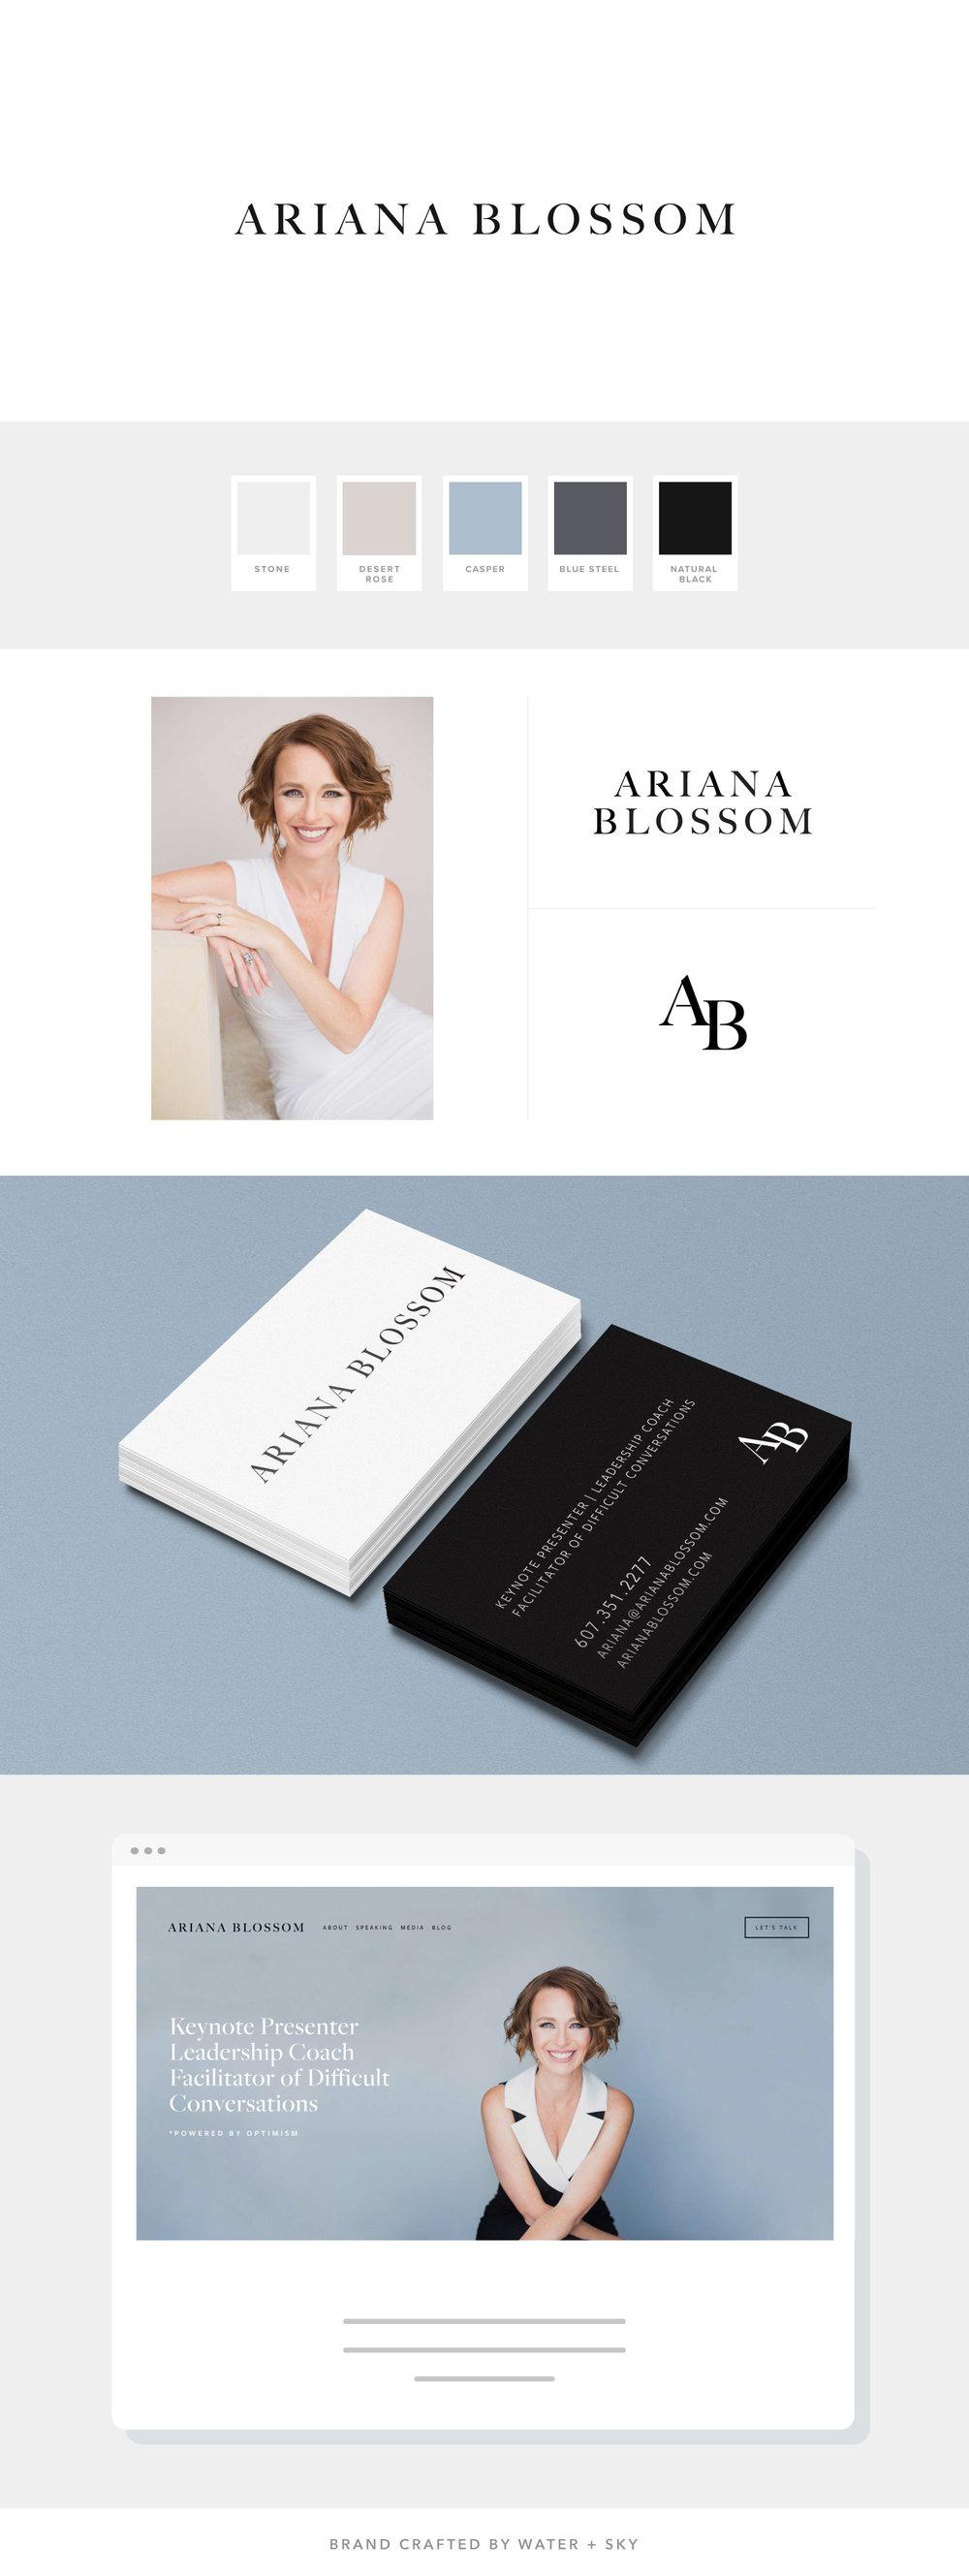 Ariana-Blossom-brand-board-website-water+sky-brand-studio.jpg